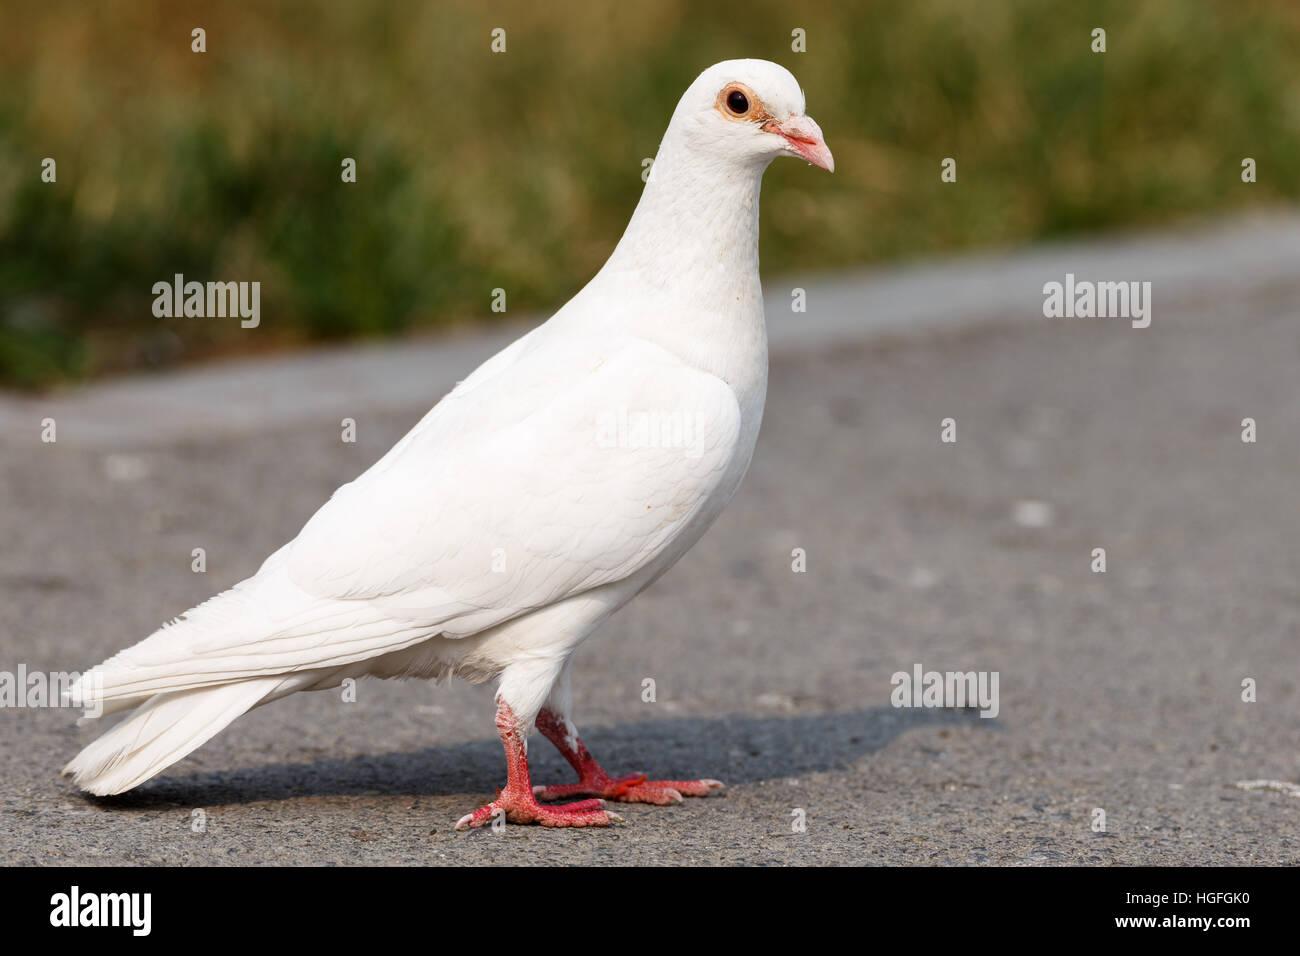 pigeon close up white pigeon city pigeons Stock Photo: 130649428 - Alamy